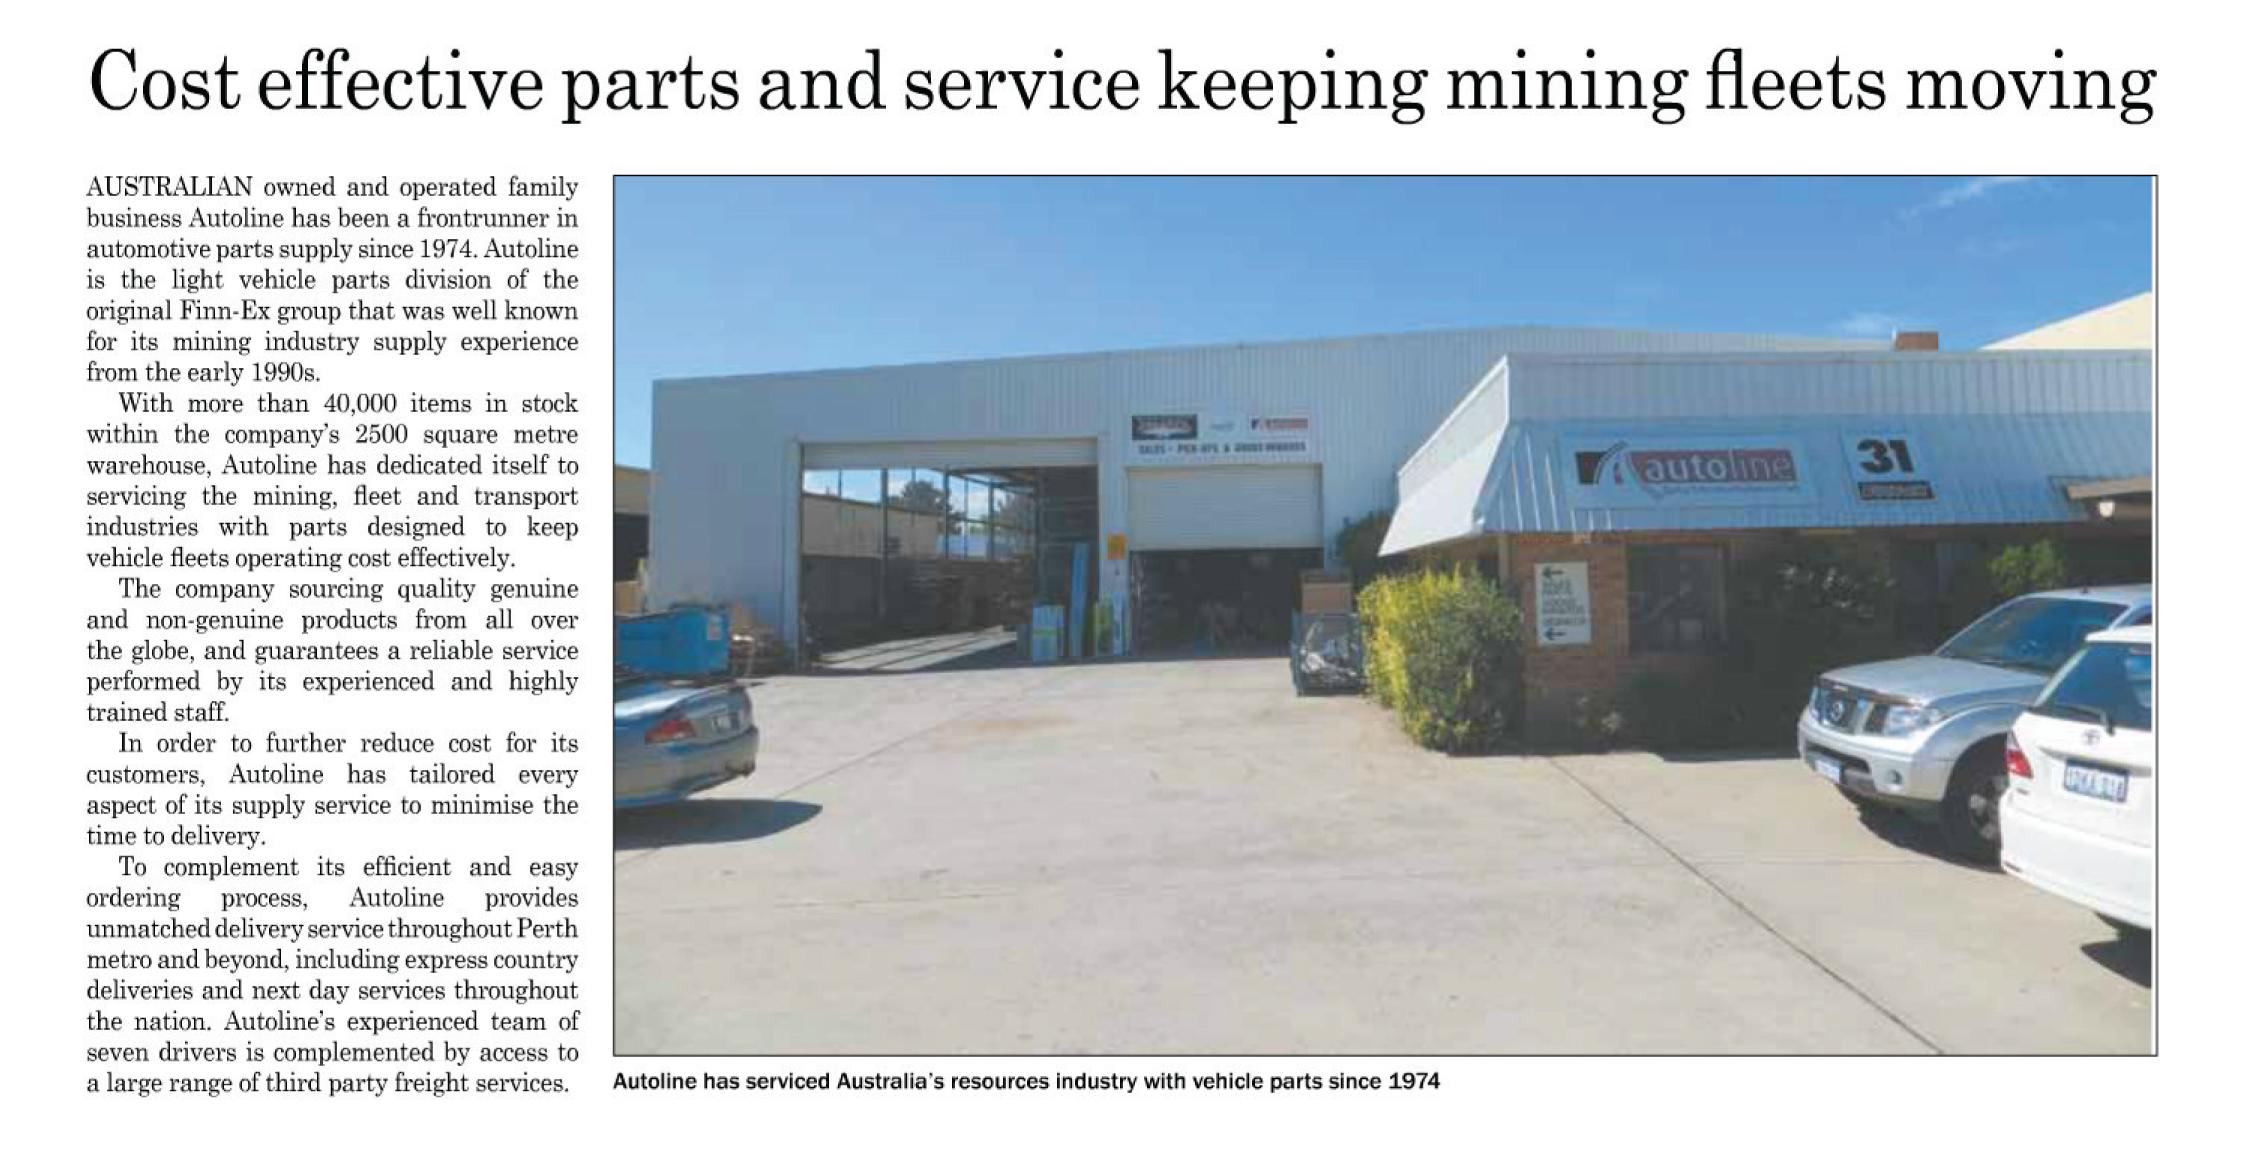 Autoline Mining Review articales